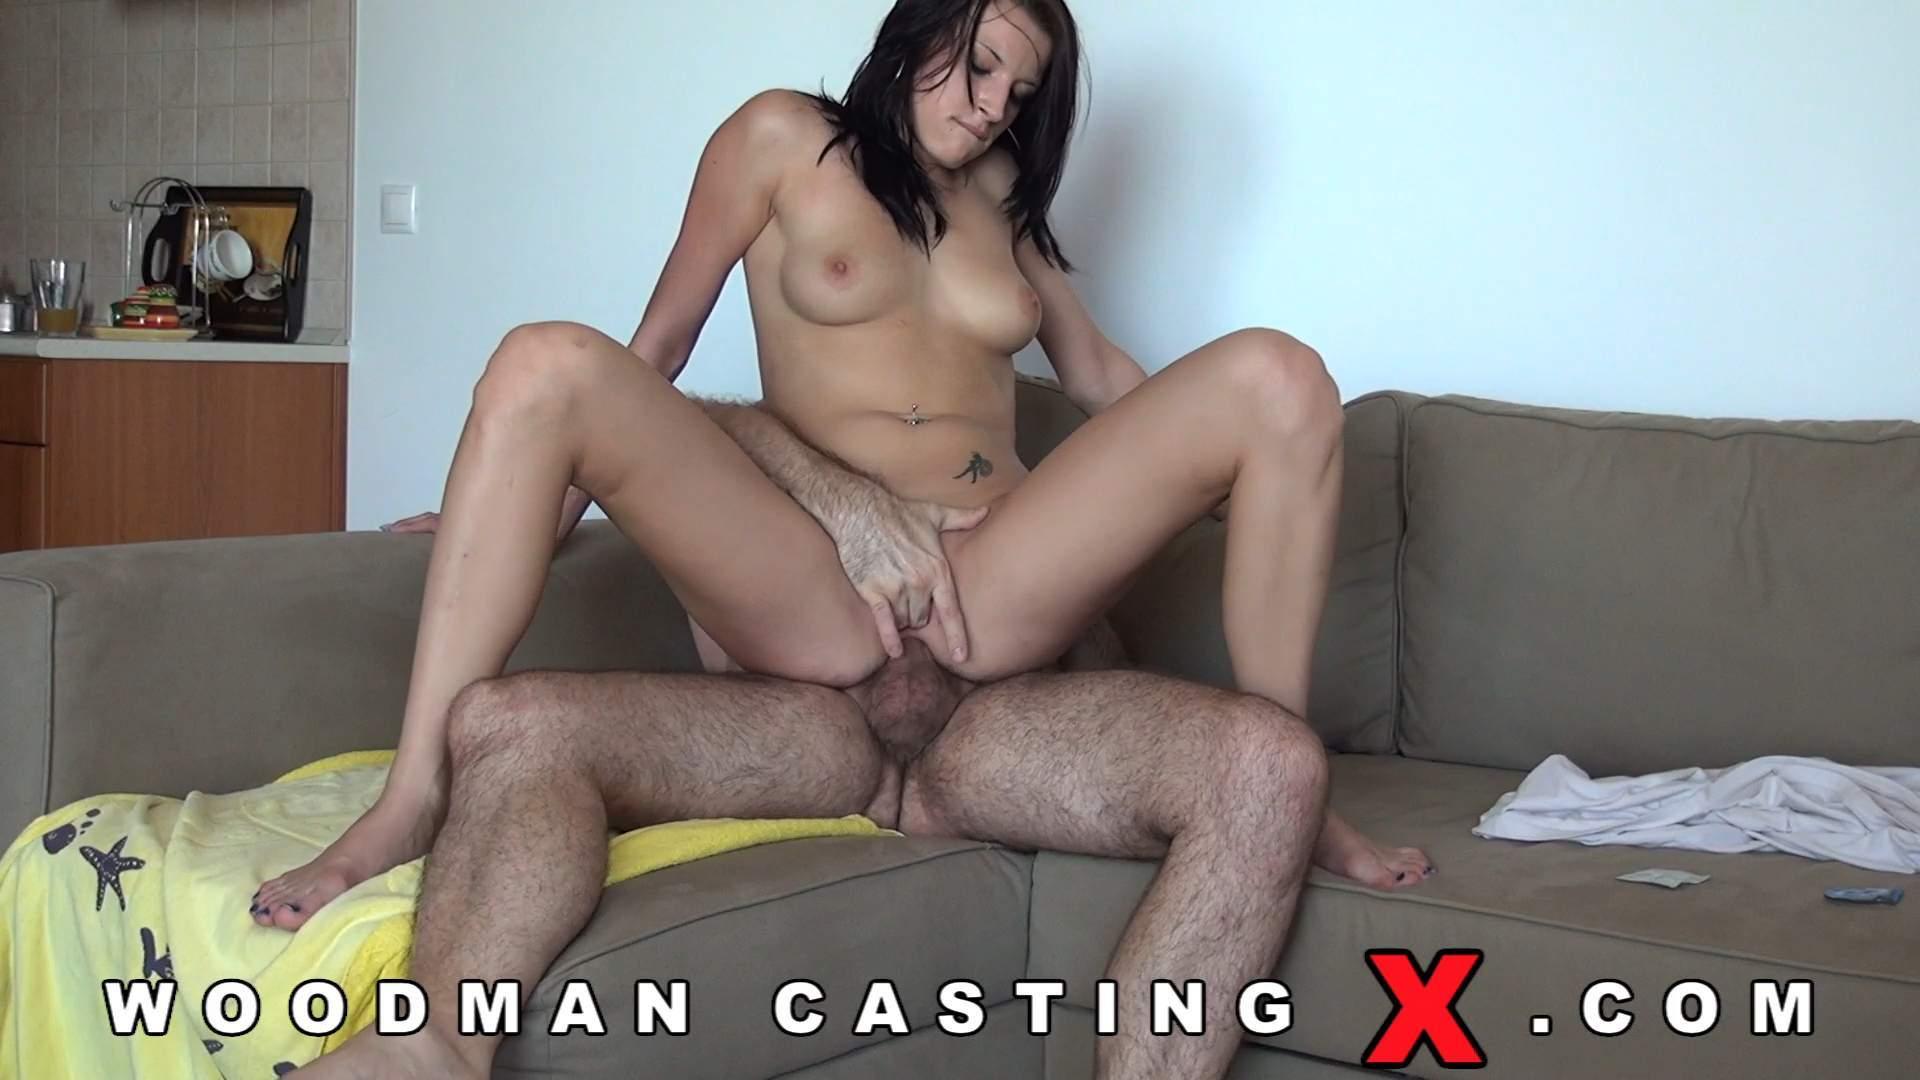 Кастинг.вудмана.порно